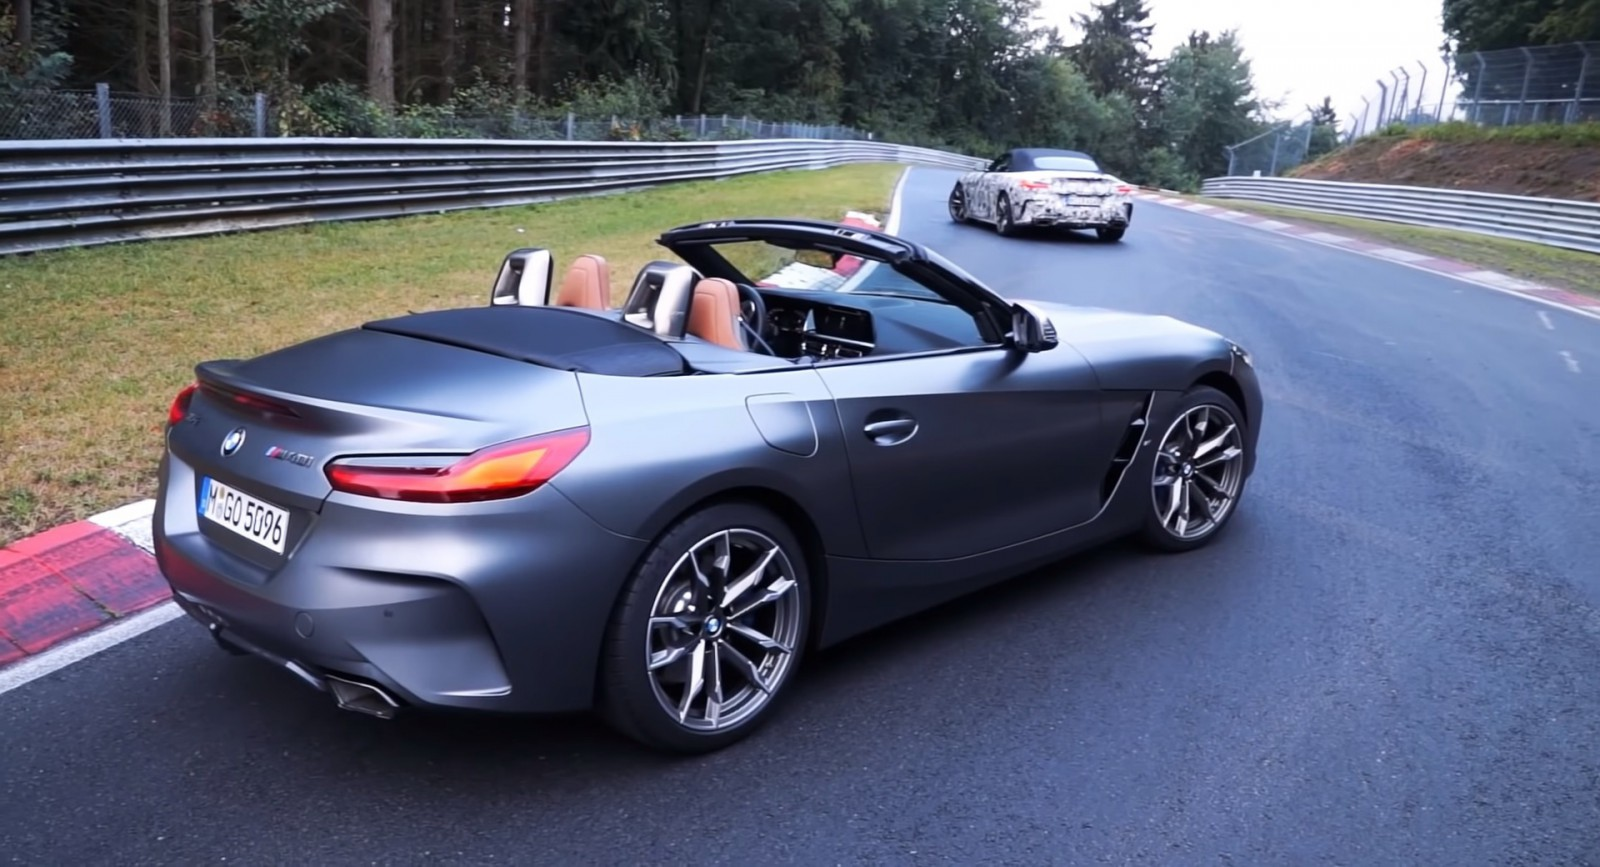 (video) Noul BMW Z4 M40i este practic la fel de rapid pe Nurburgring precum un M5 F10